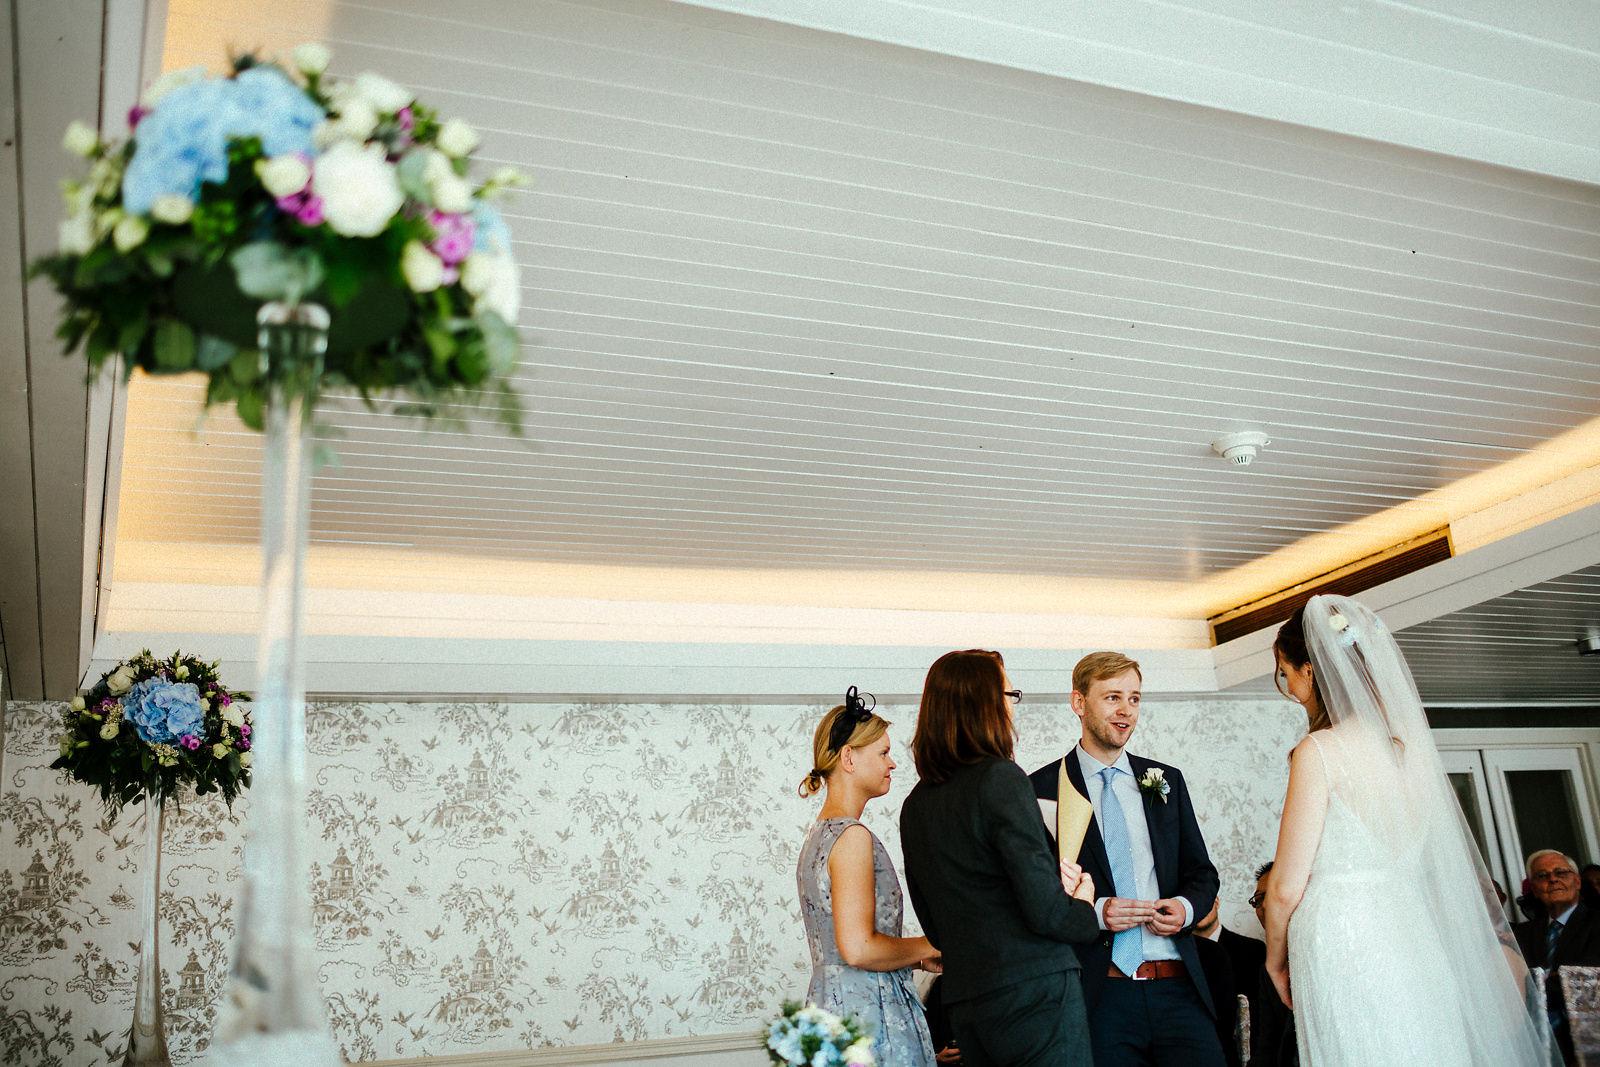 Wedding ceremony at Ravens Ait Surbiton